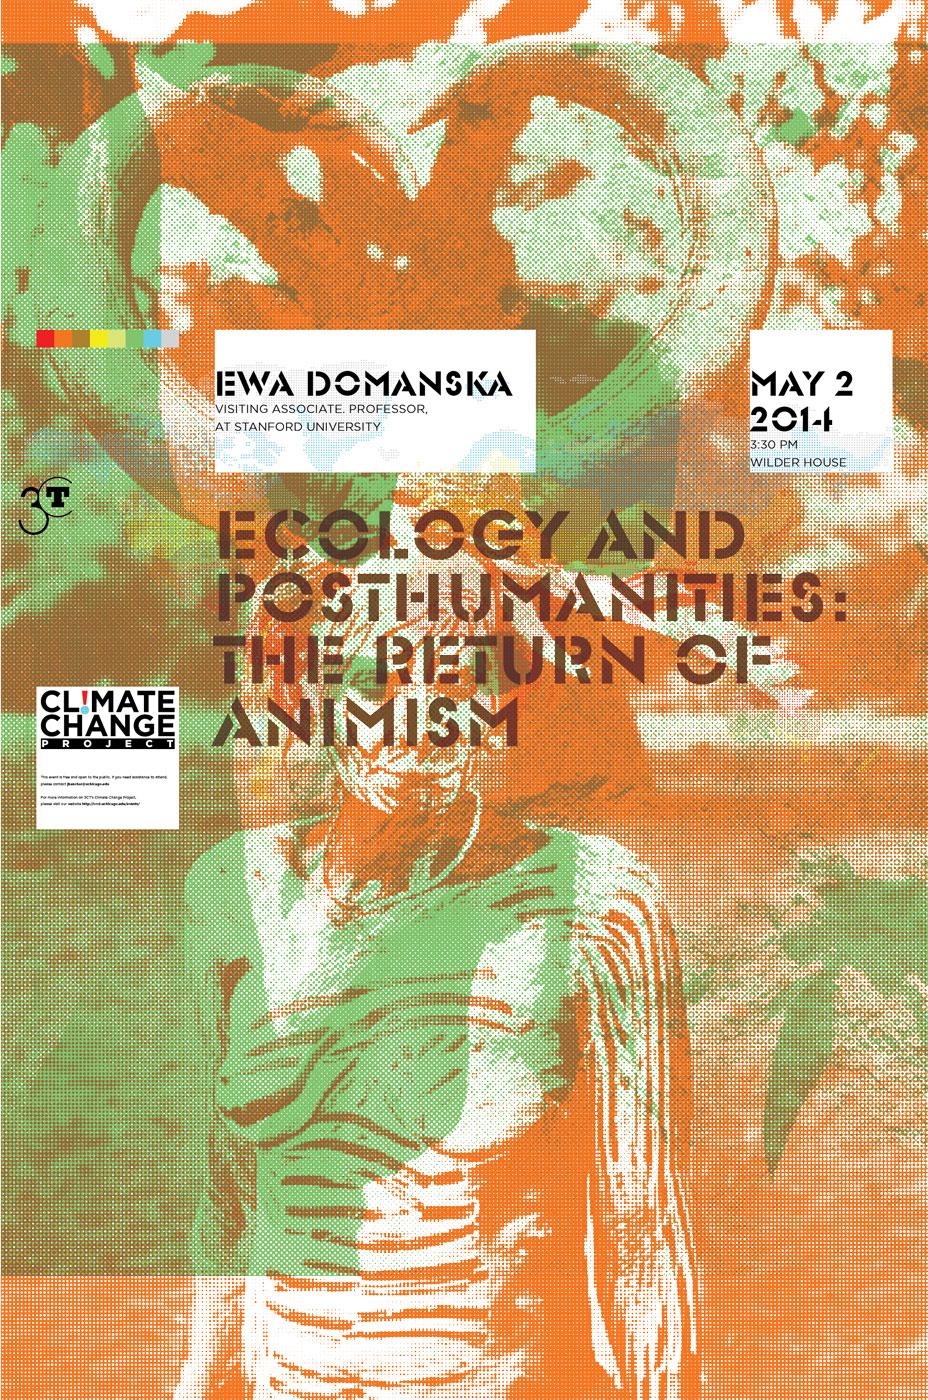 Ewa Domanska Climate Change poster